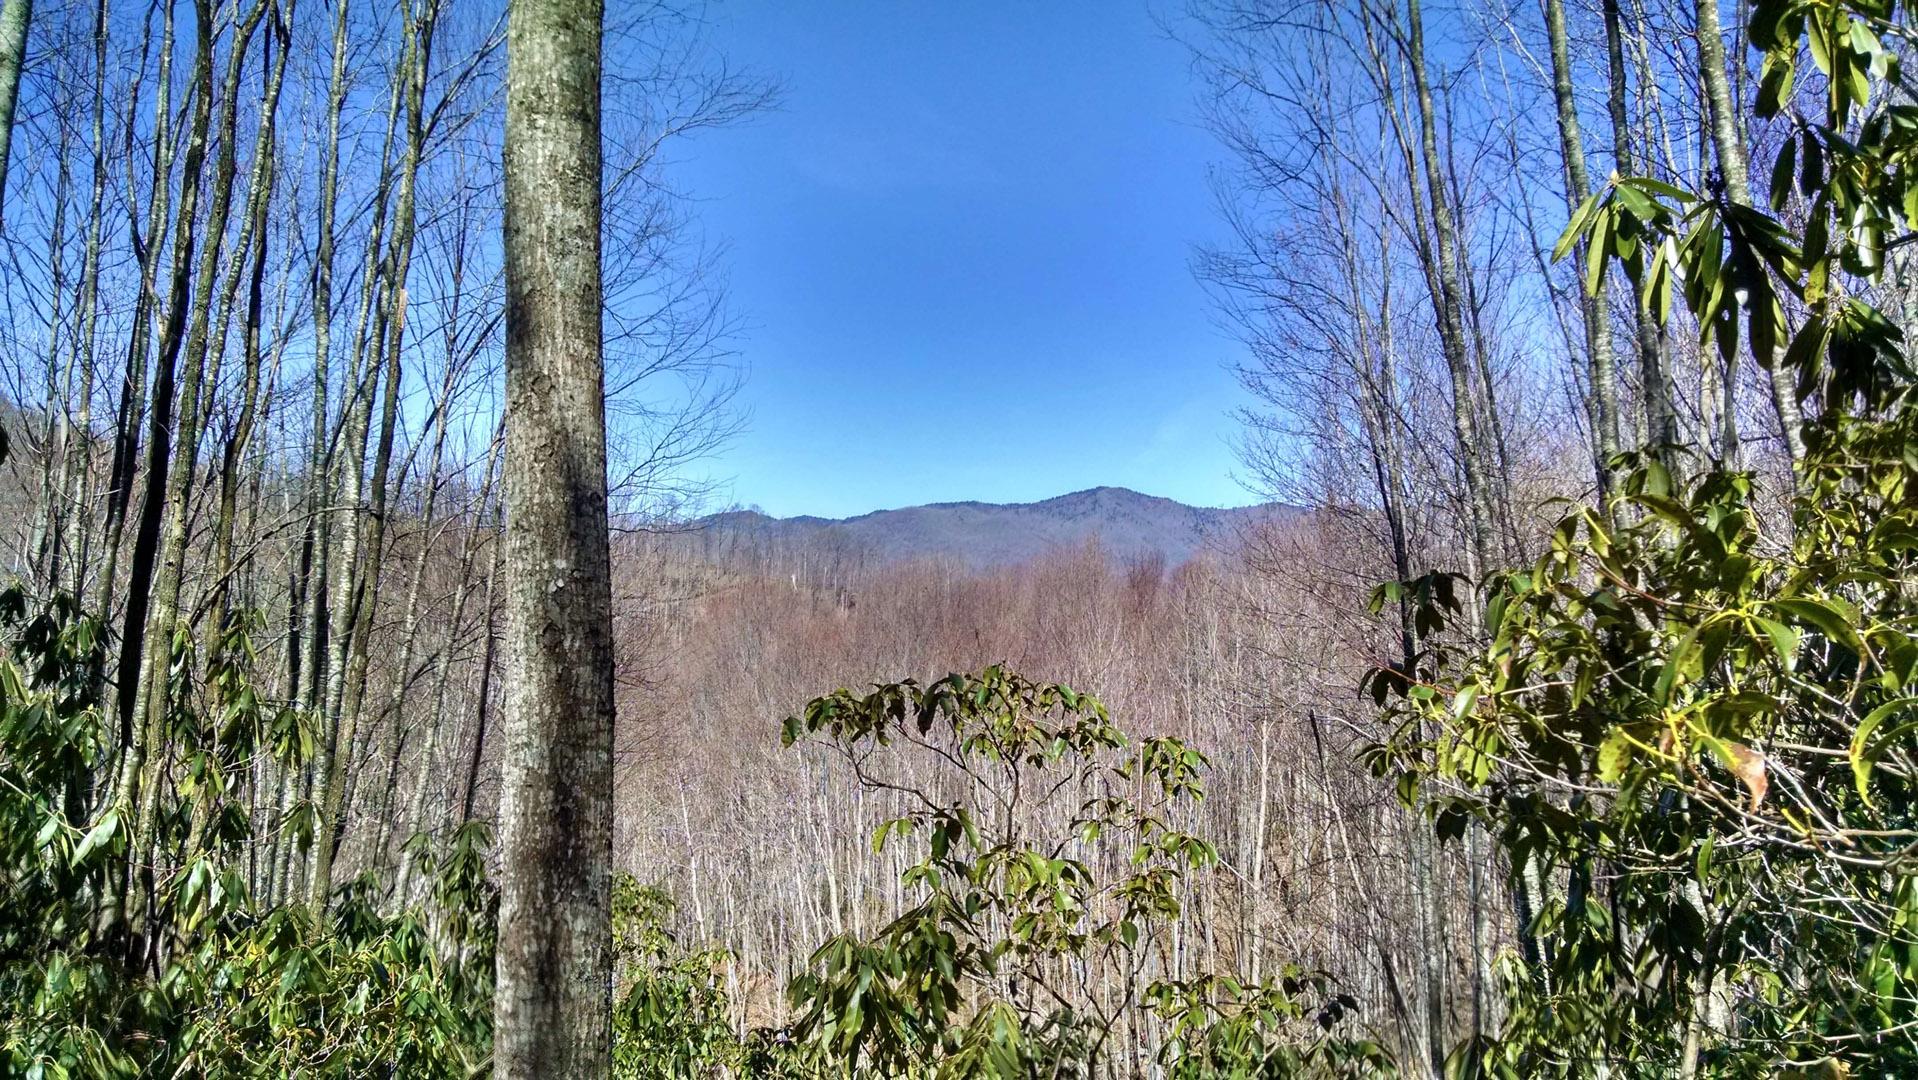 Balsam mountain preserve lot 233 balsam mountain preserve for Balsam mountain